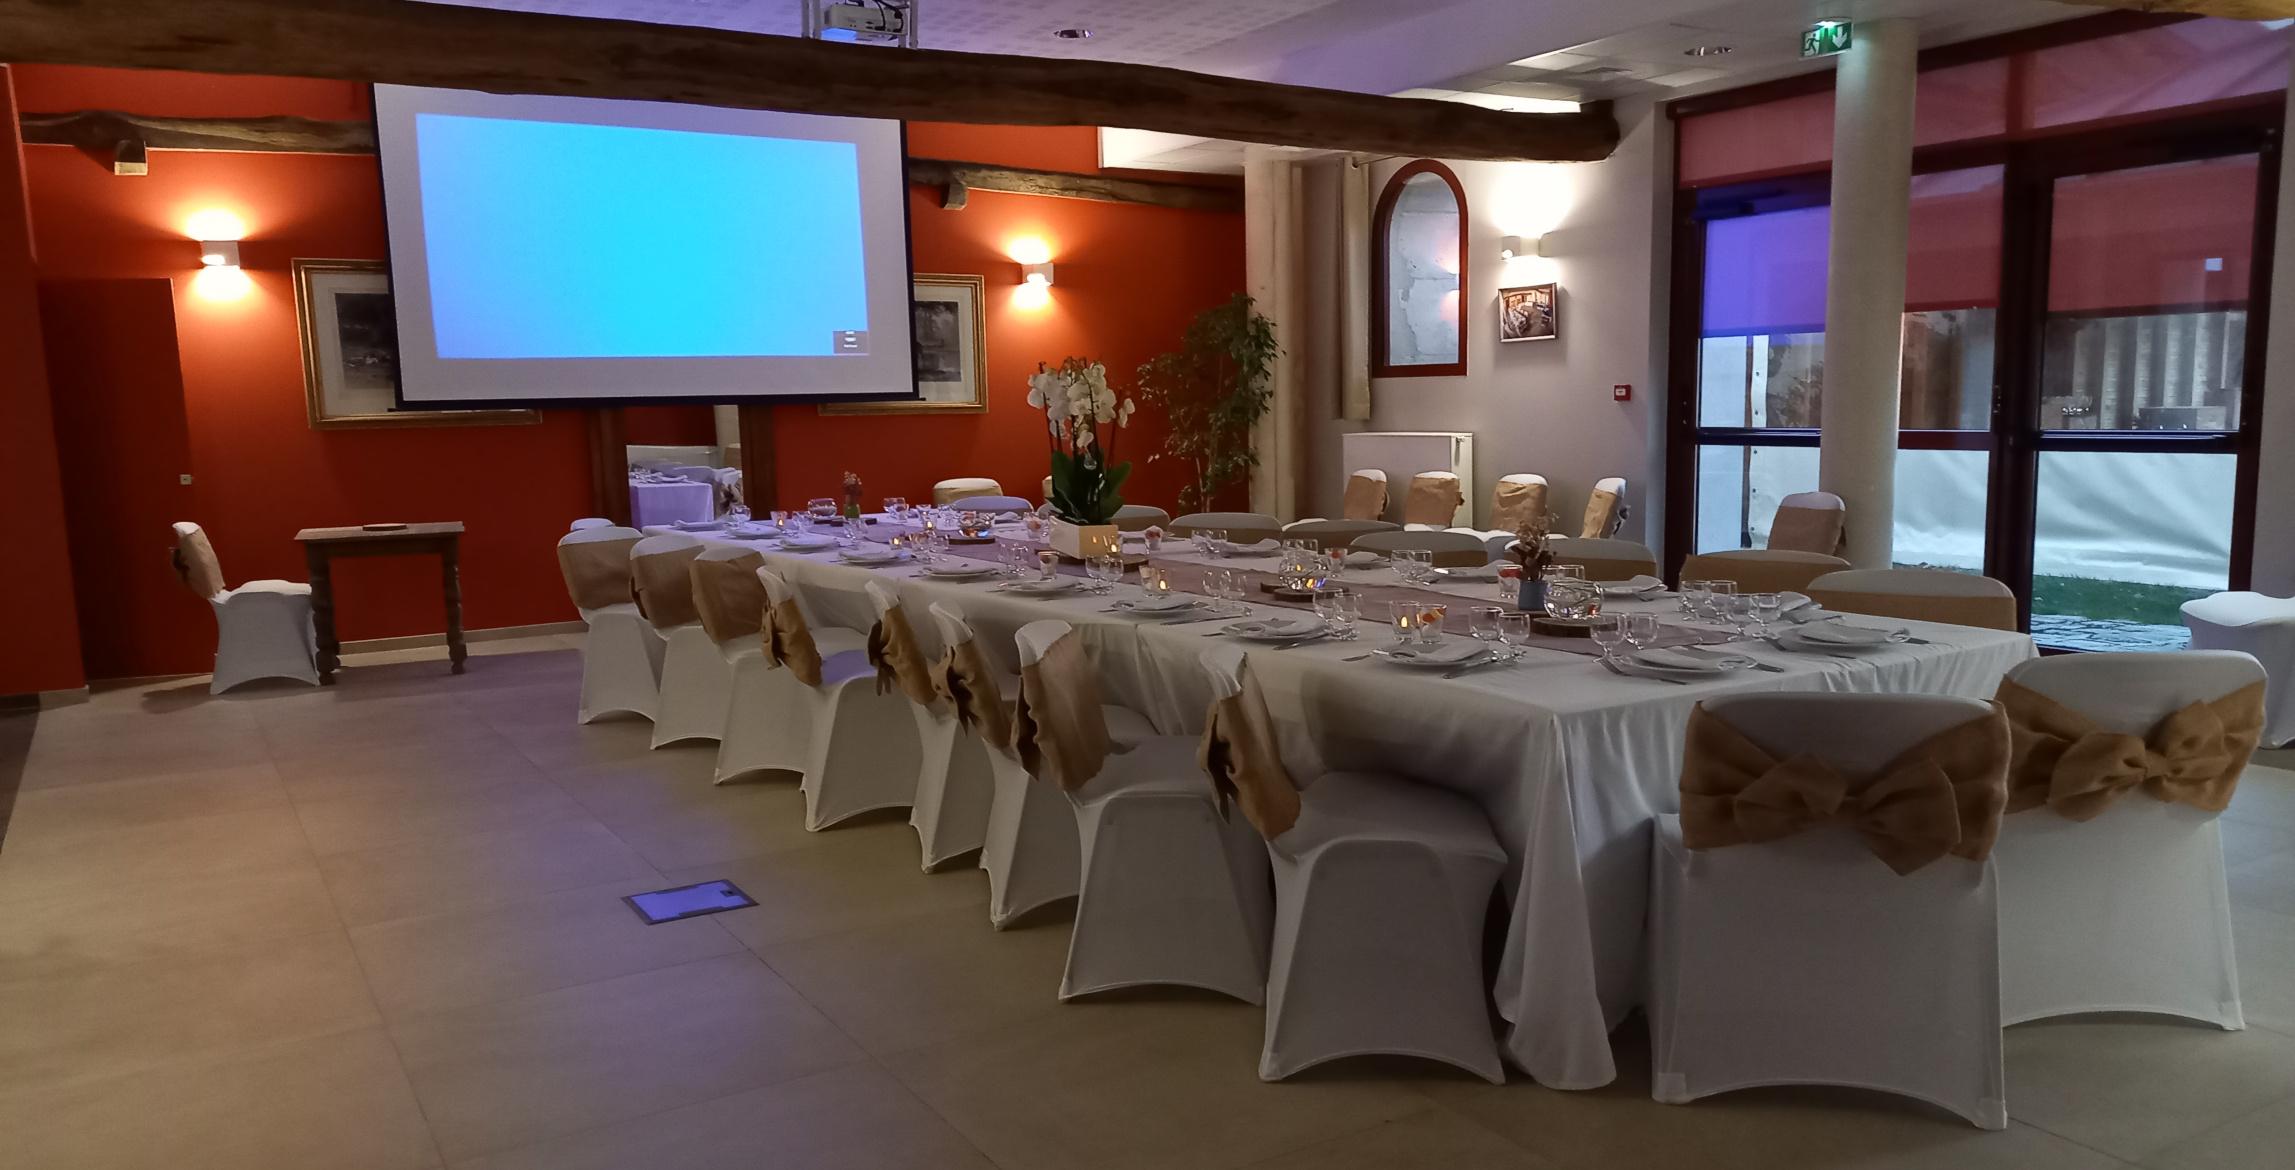 reception-salle-serenite-conseils-installation-rangement-recevoir-la-croisee-des-possibles-oise